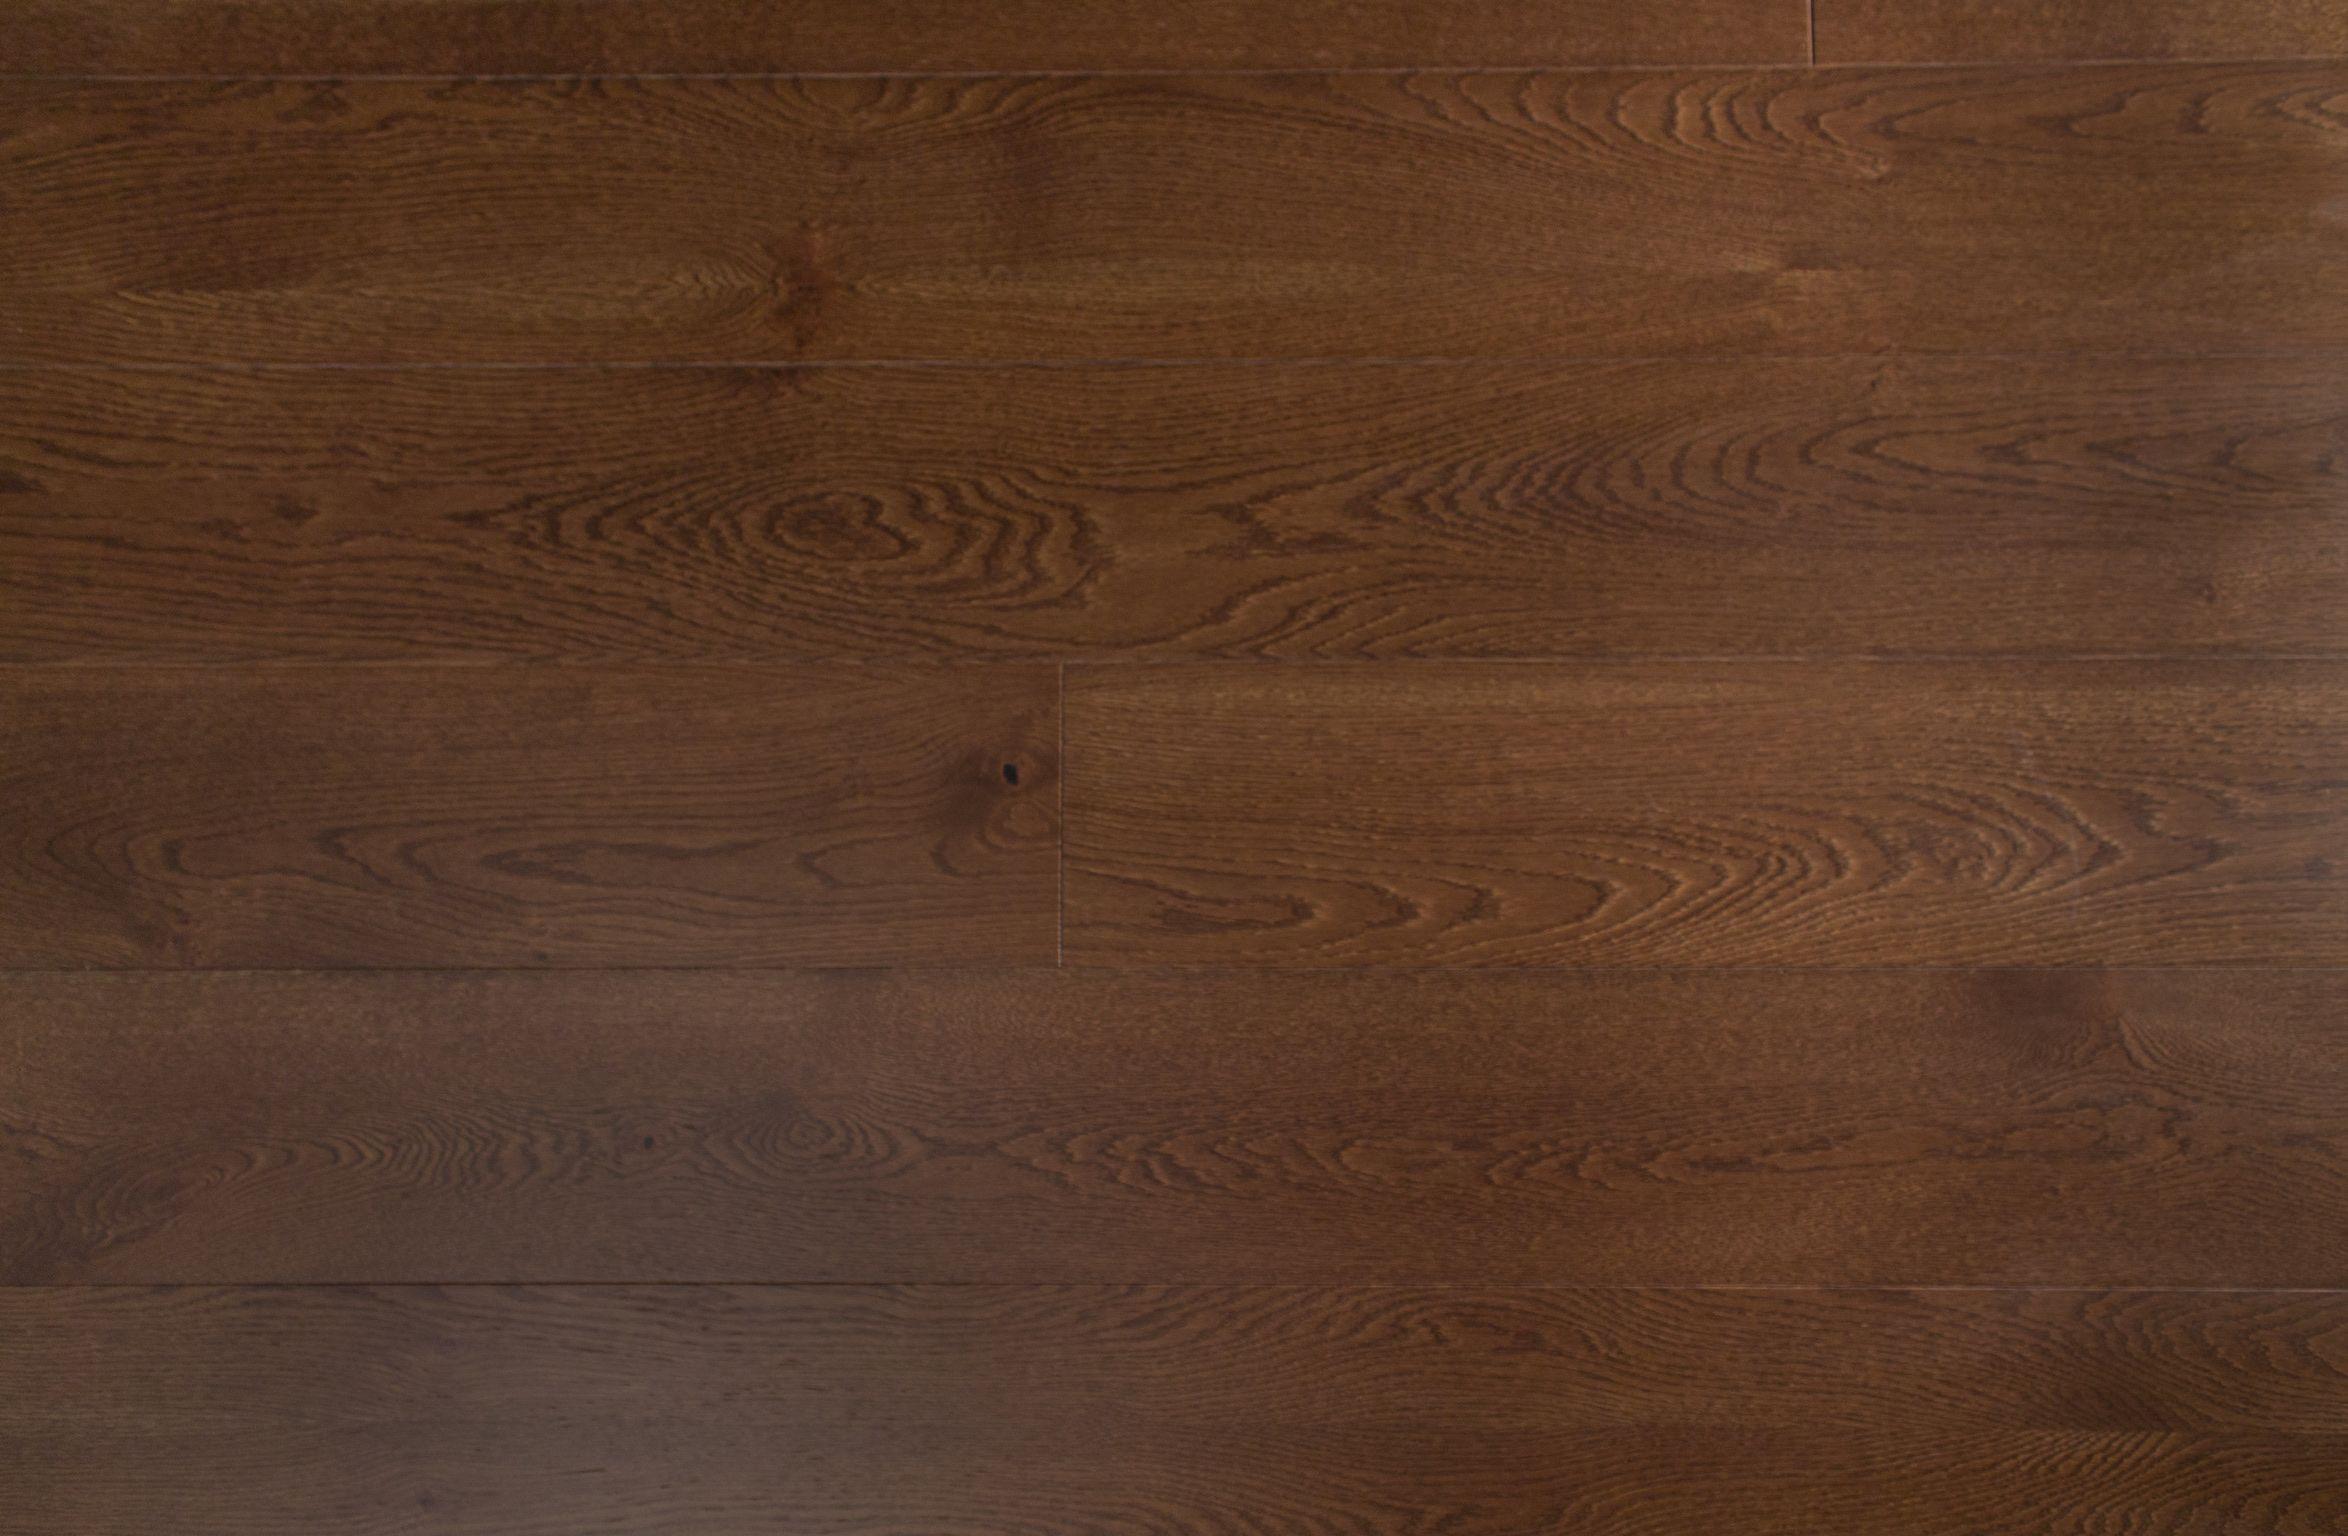 wide plank hardwood flooring price of wide plank wood flooring wide plank medium brown white oak hdf intended for wide plank wood flooring wide plank medium brown white oak hdf hardwood flooring